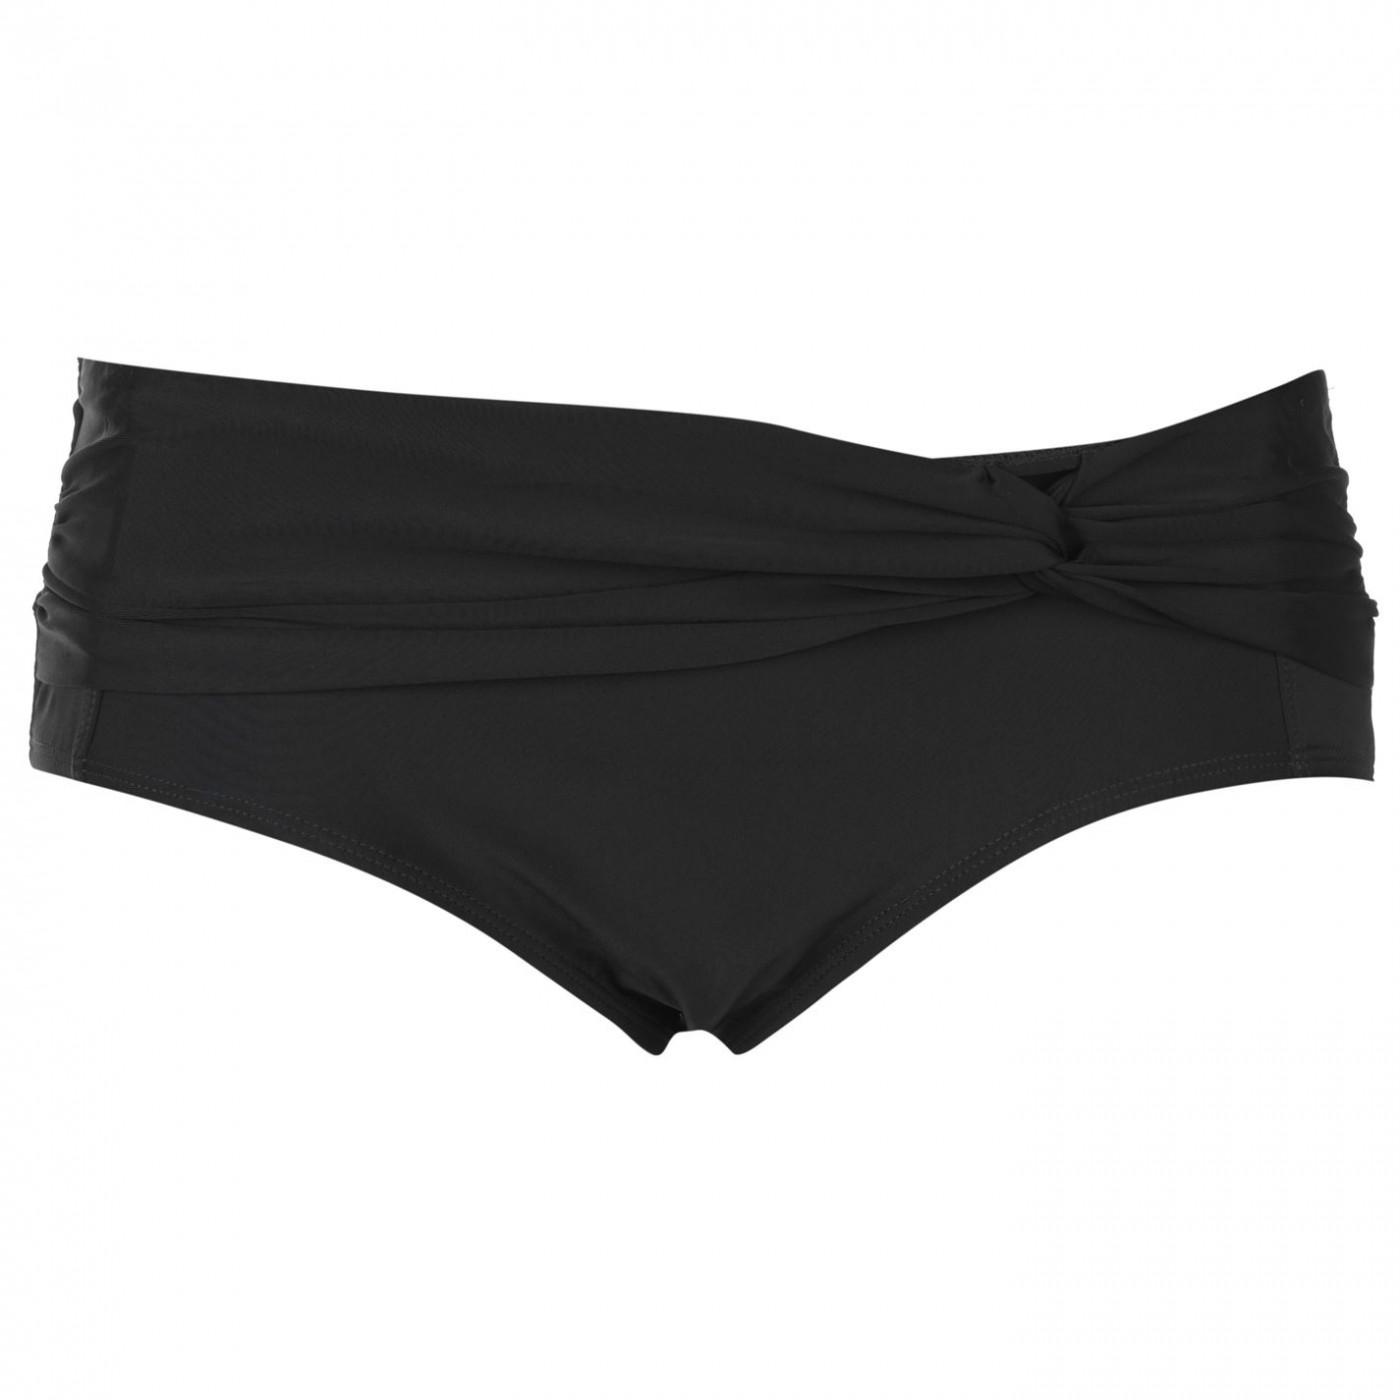 Full Circle Swim Shorts Ladies